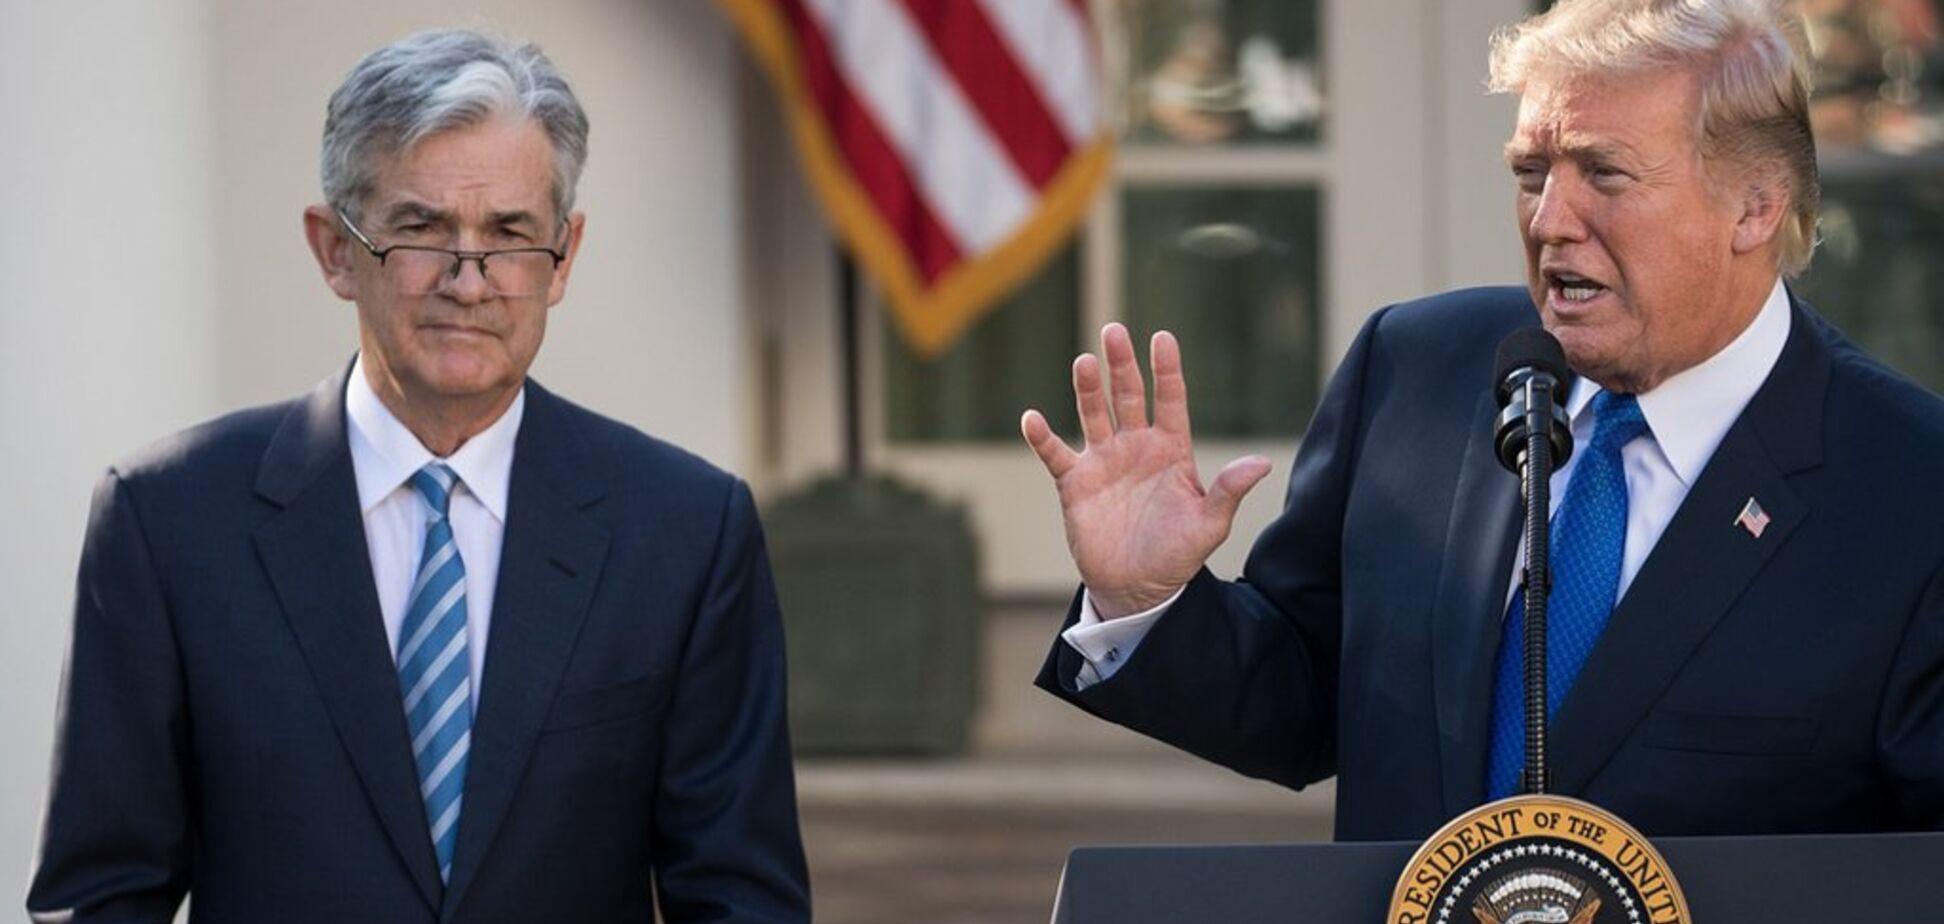 Трамп объявил ФРС главной проблемой экономики США: детали конфликта